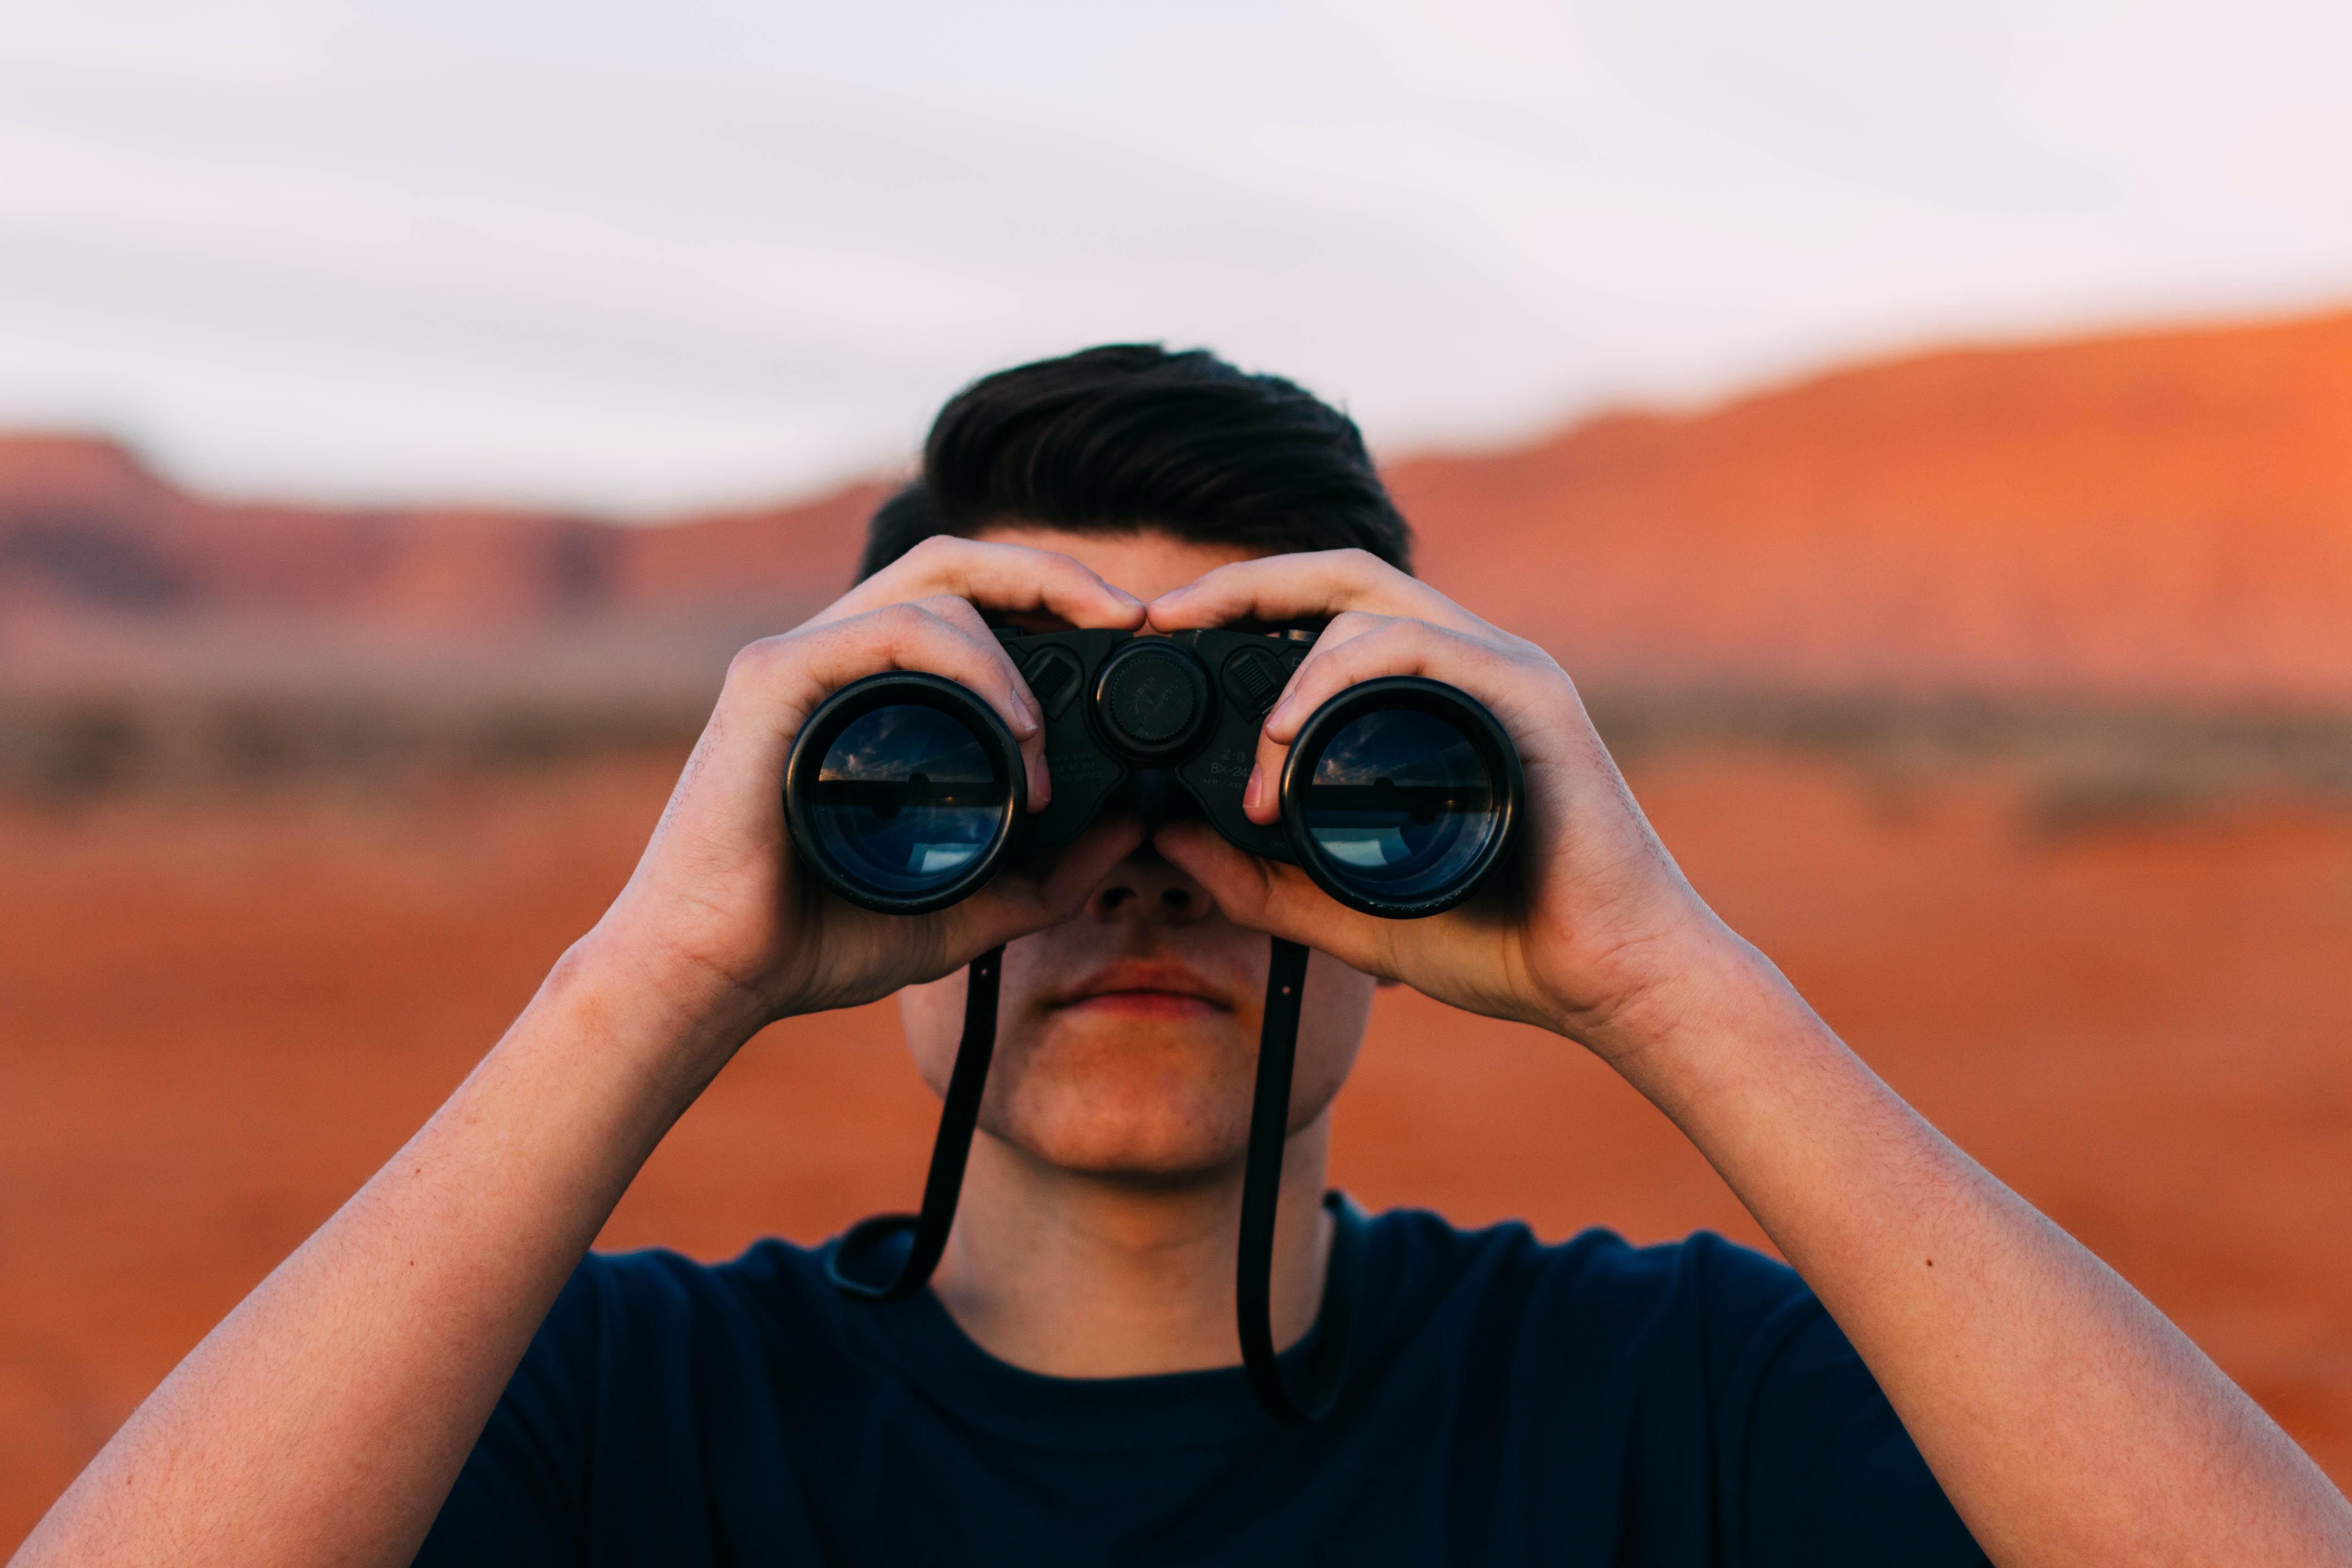 A man looking through binoculars in the desert